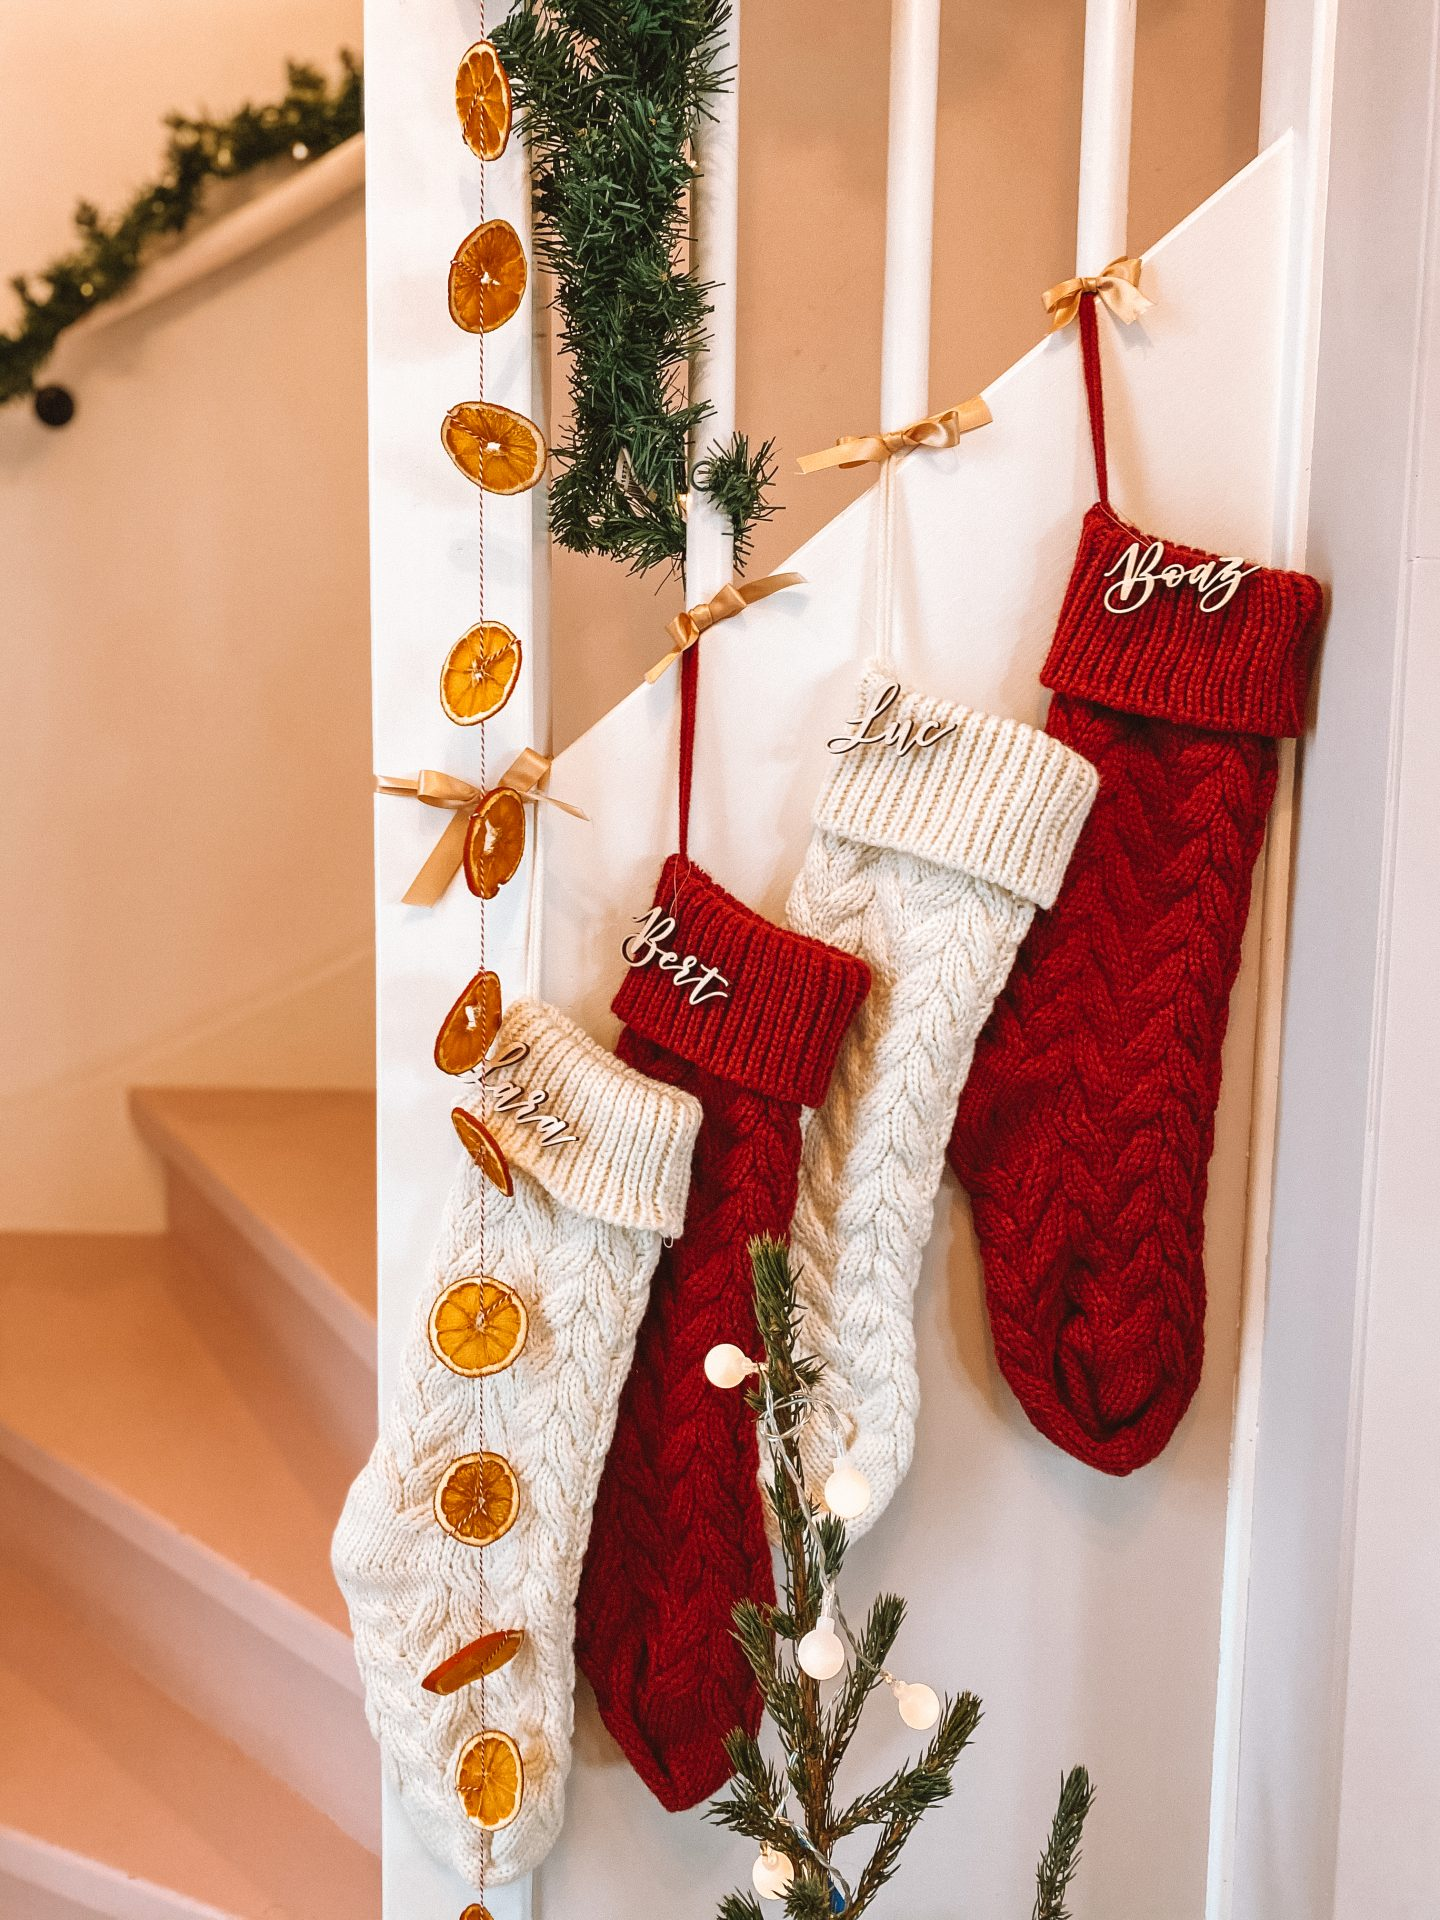 Christmas Crafting: DIY Dried Orange Garland